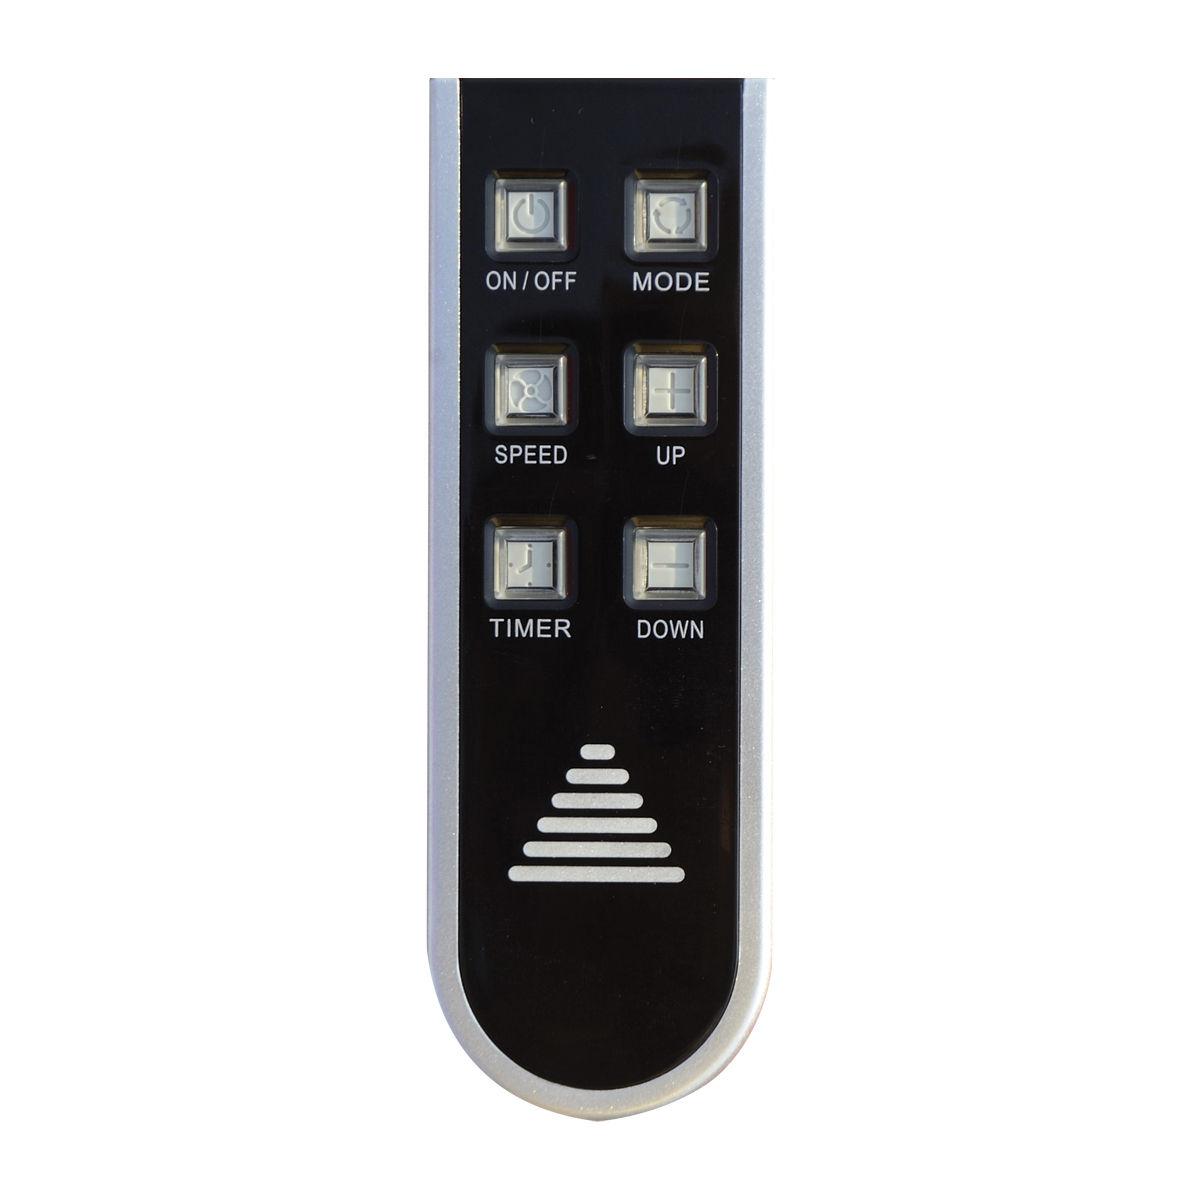 Haier 12 000 BTU Portable Air Conditioner with 11 000 BTU Heater  #526179